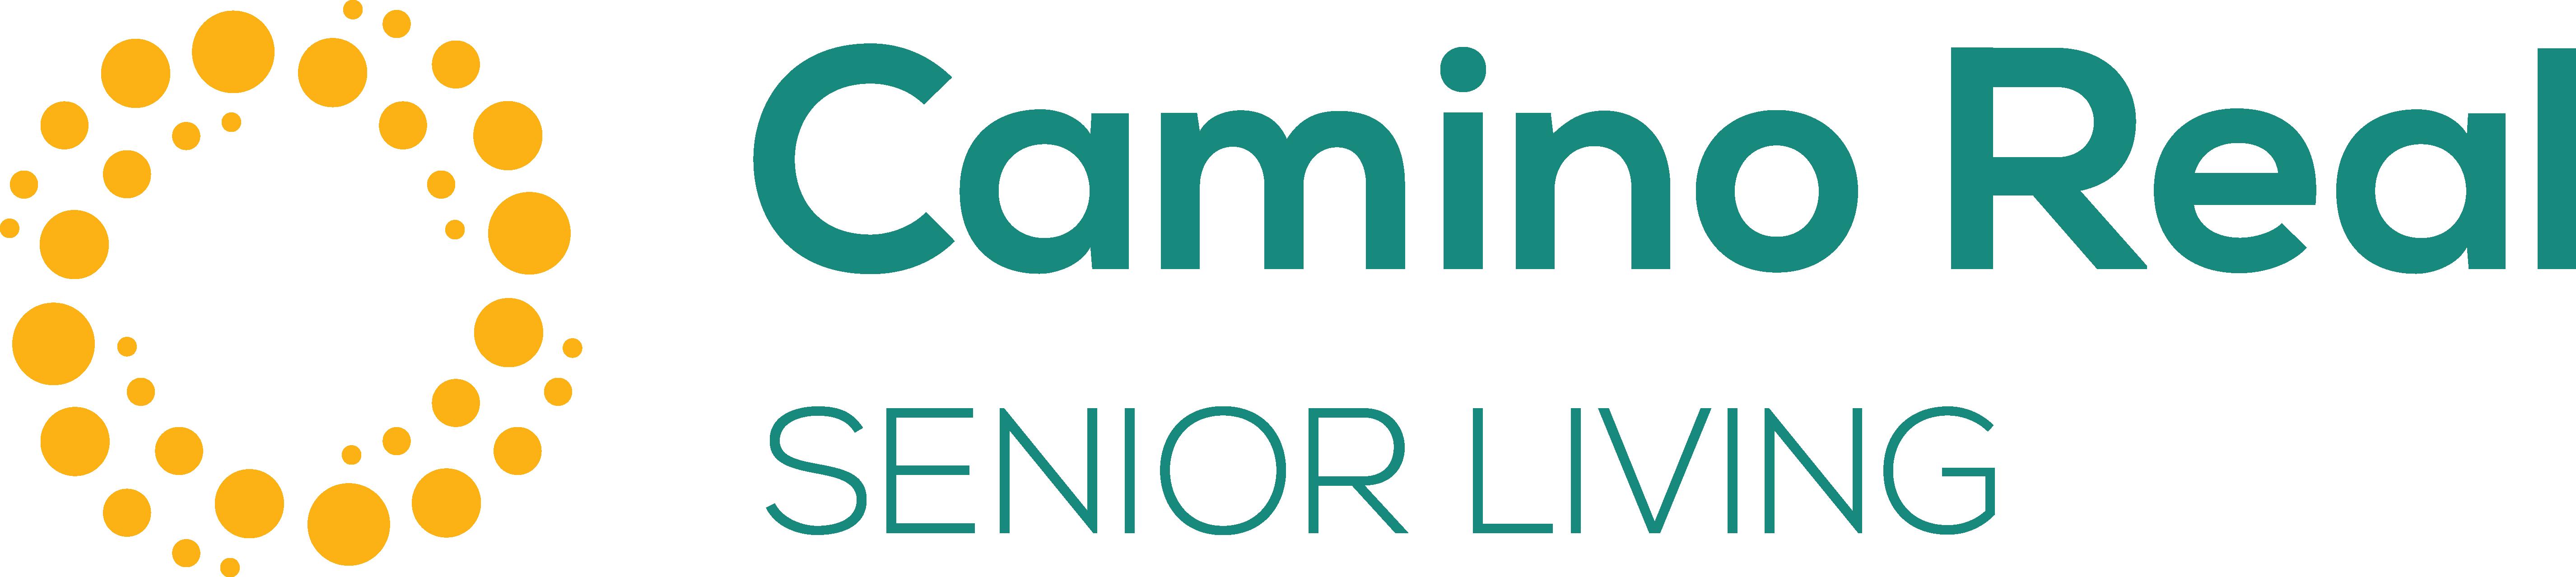 Camino Real Senior Living